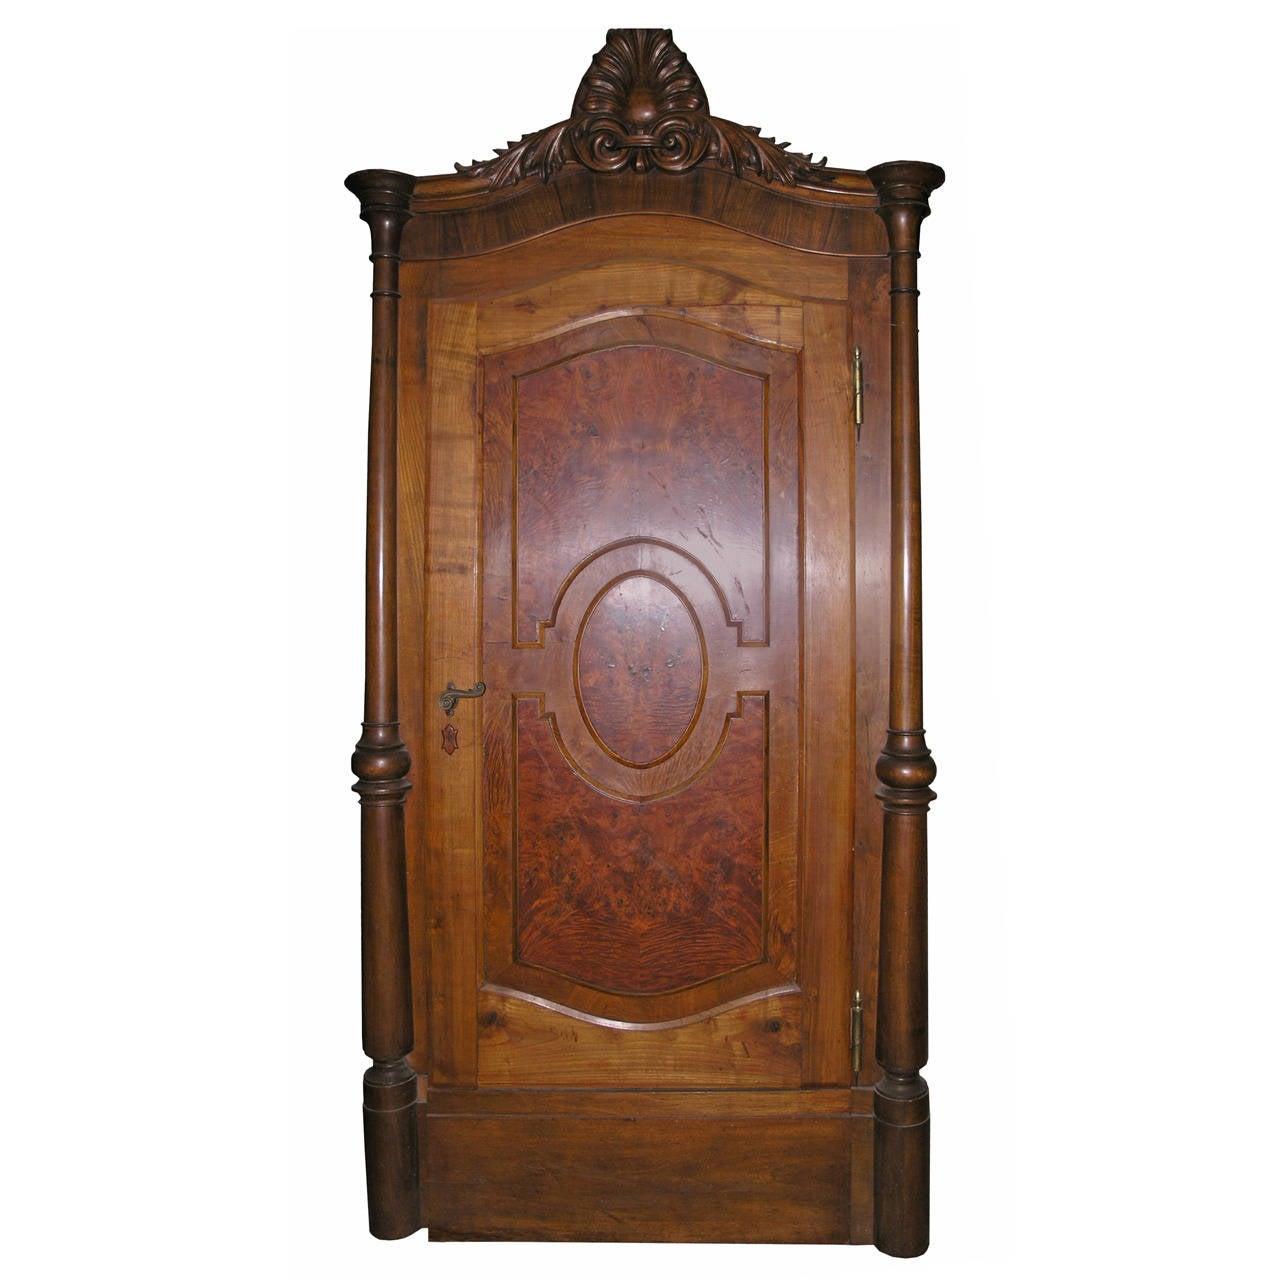 Antique Door with Original Frame For Sale - Antique Door With Original Frame For Sale At 1stdibs